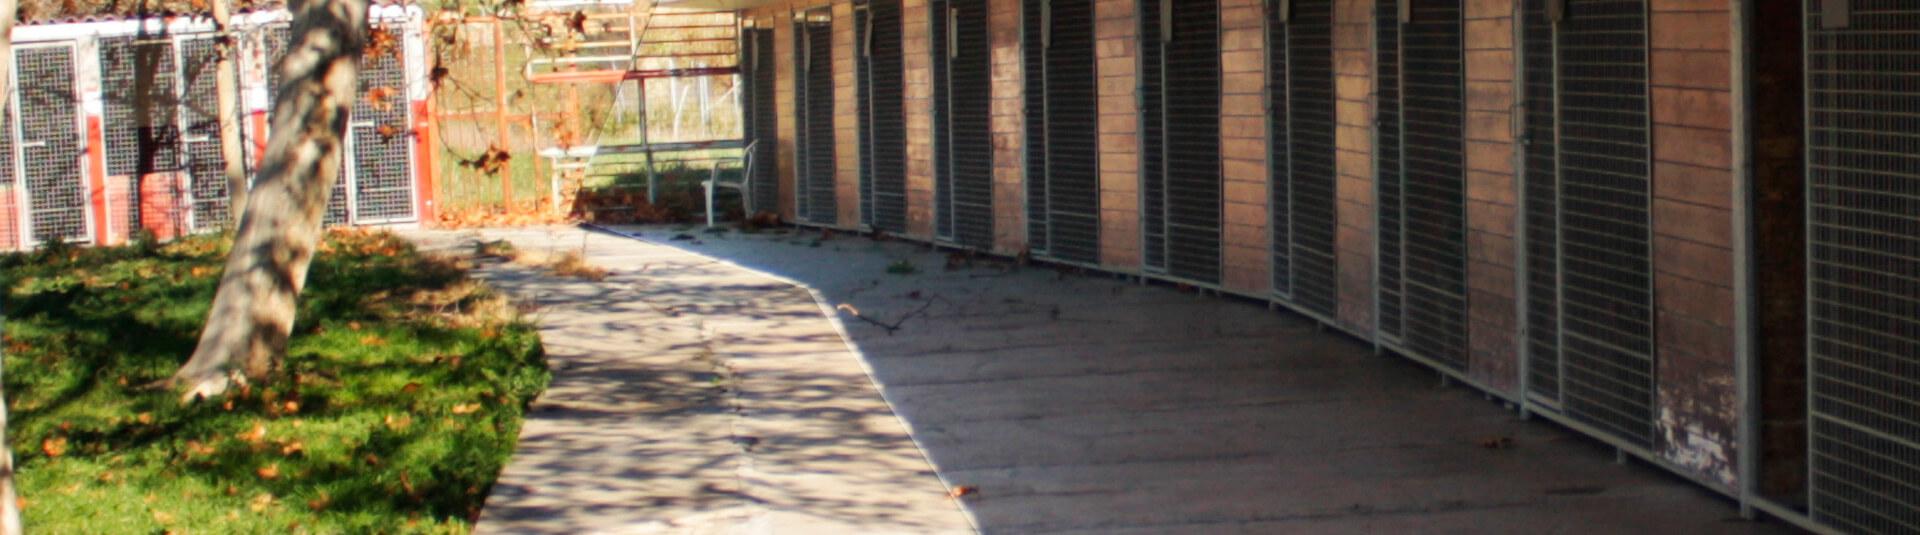 Residencia canina en Madrid